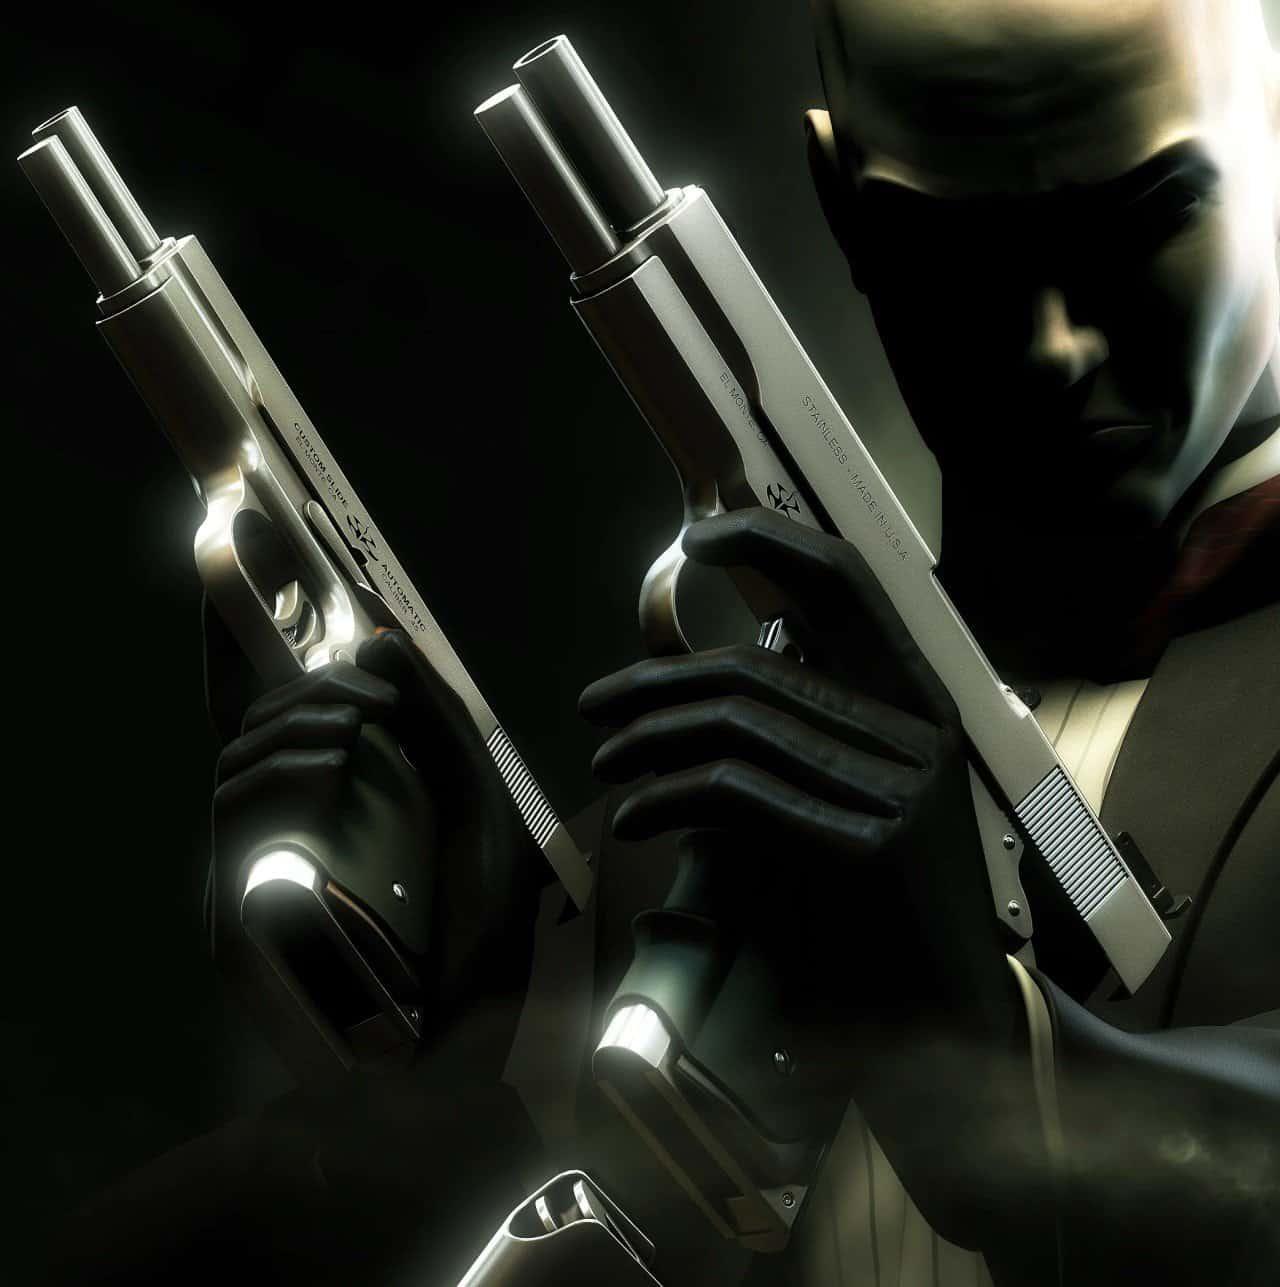 agent 47 holding silverballer pistols